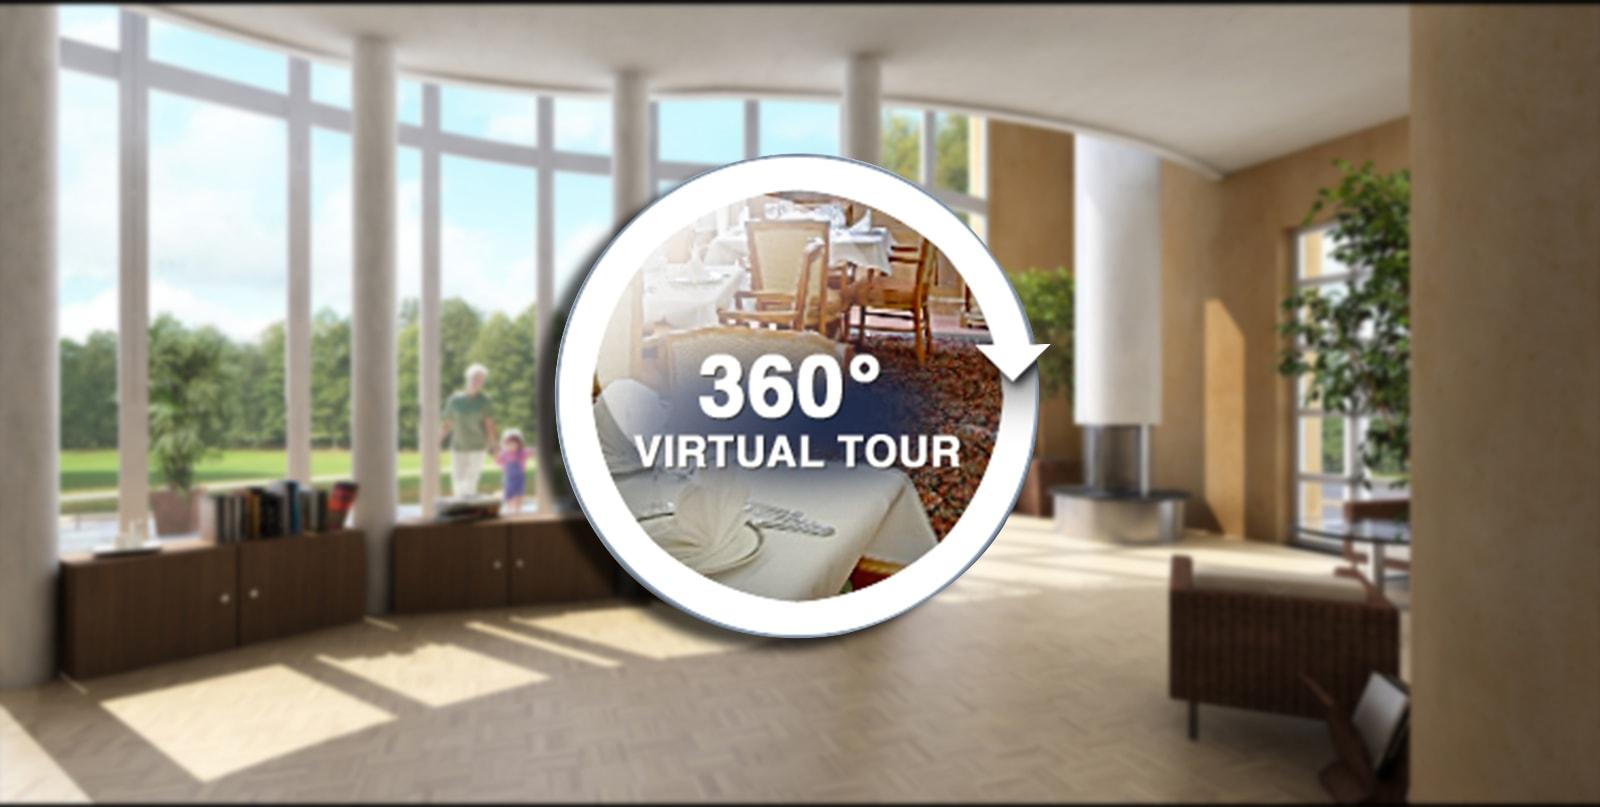 Click for 360 Degree Virtual Tour